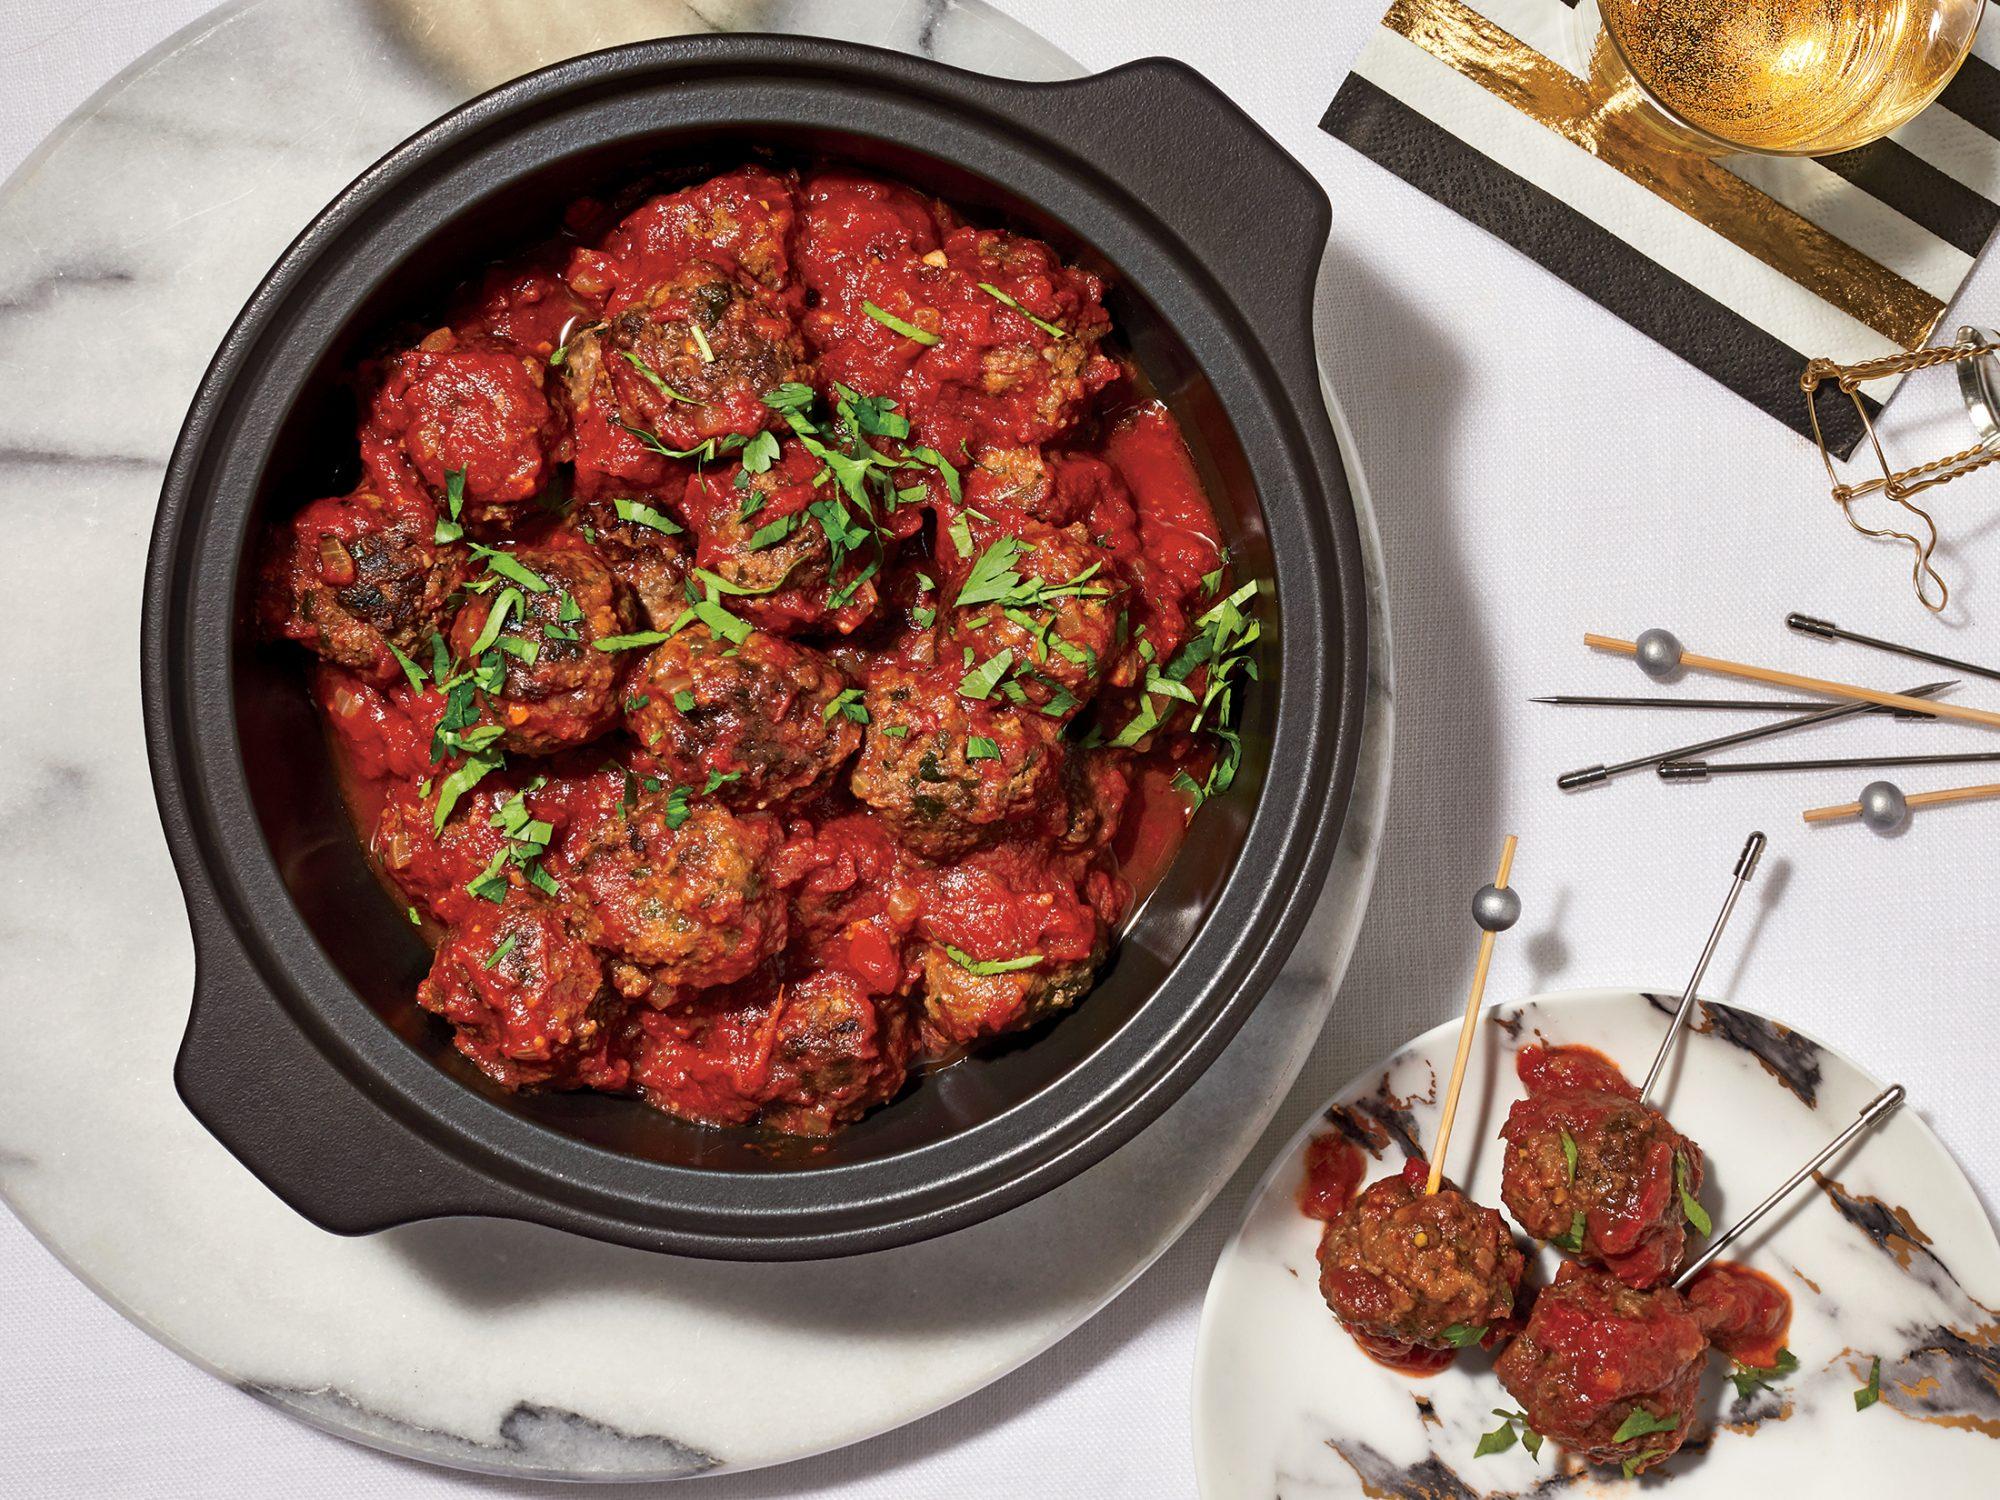 Saucy Mini Meatballs